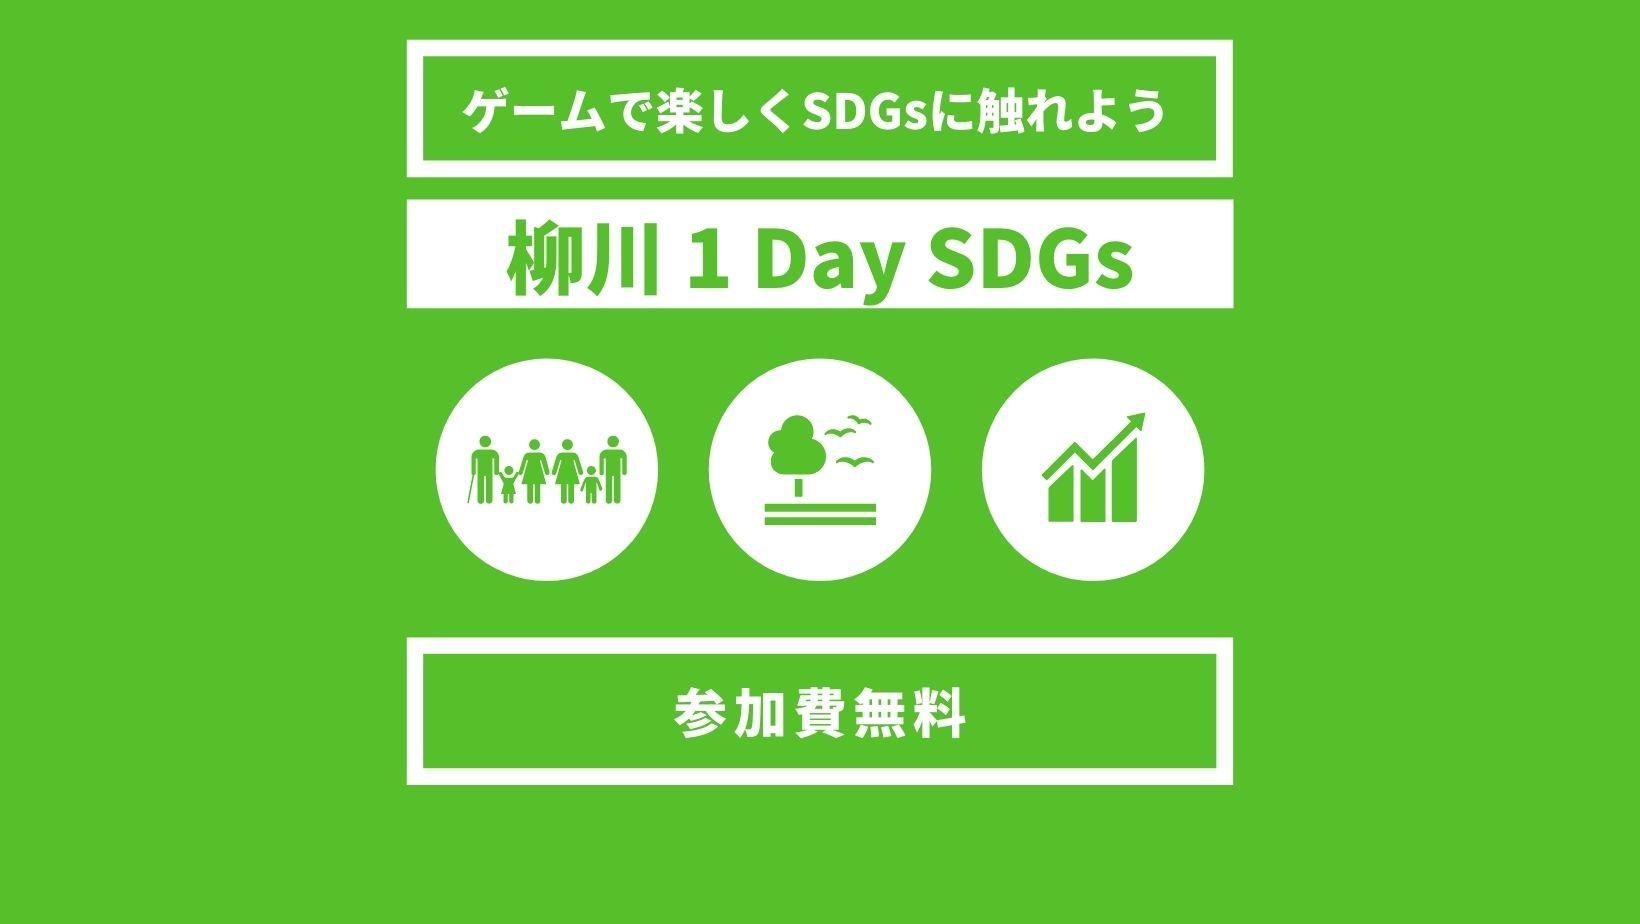 柳川 1 Day SDGs